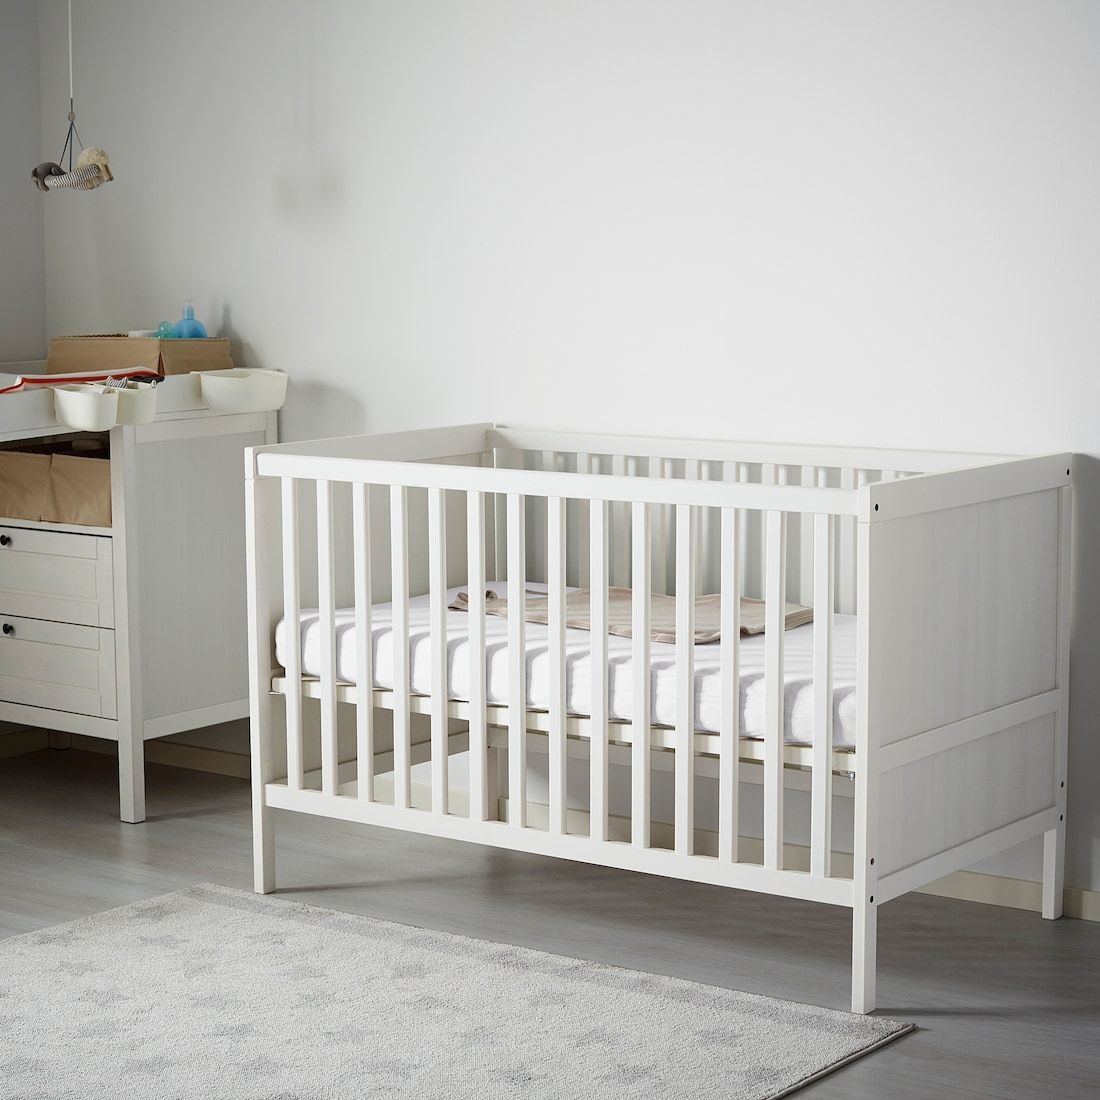 "SUNDVIK Crib white 27 1/2x52 "" in 2020 Ikea sundvik"